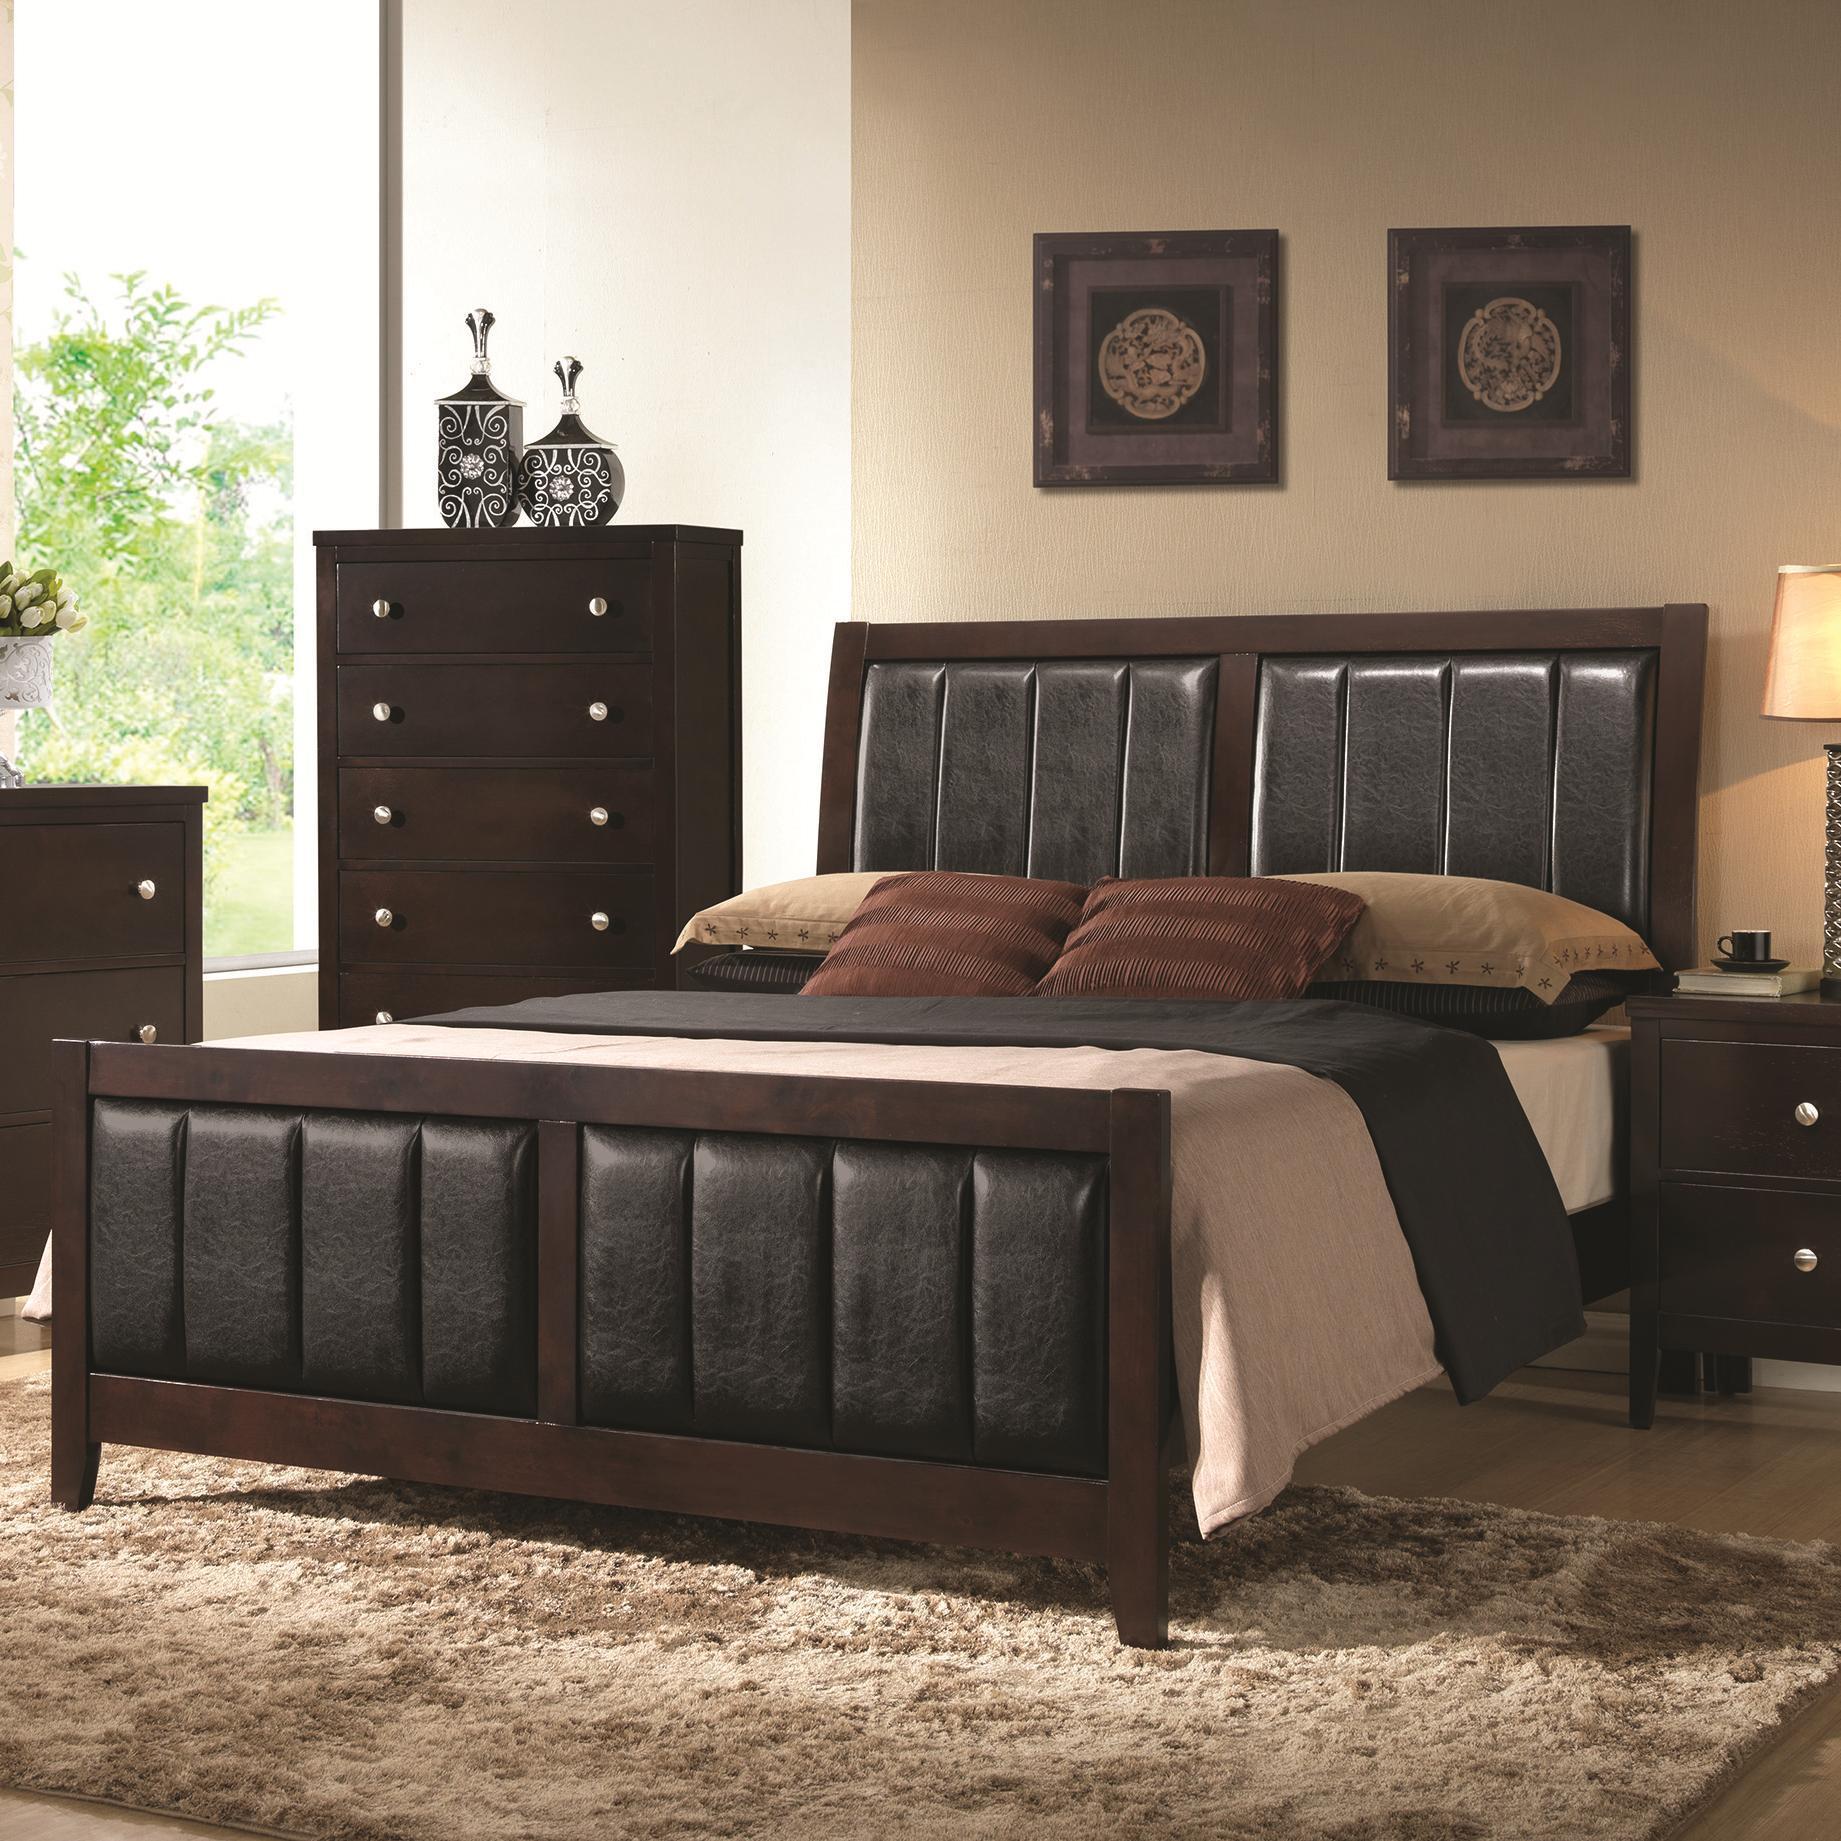 Coaster Carlton California King Bed - Item Number: 202091KW